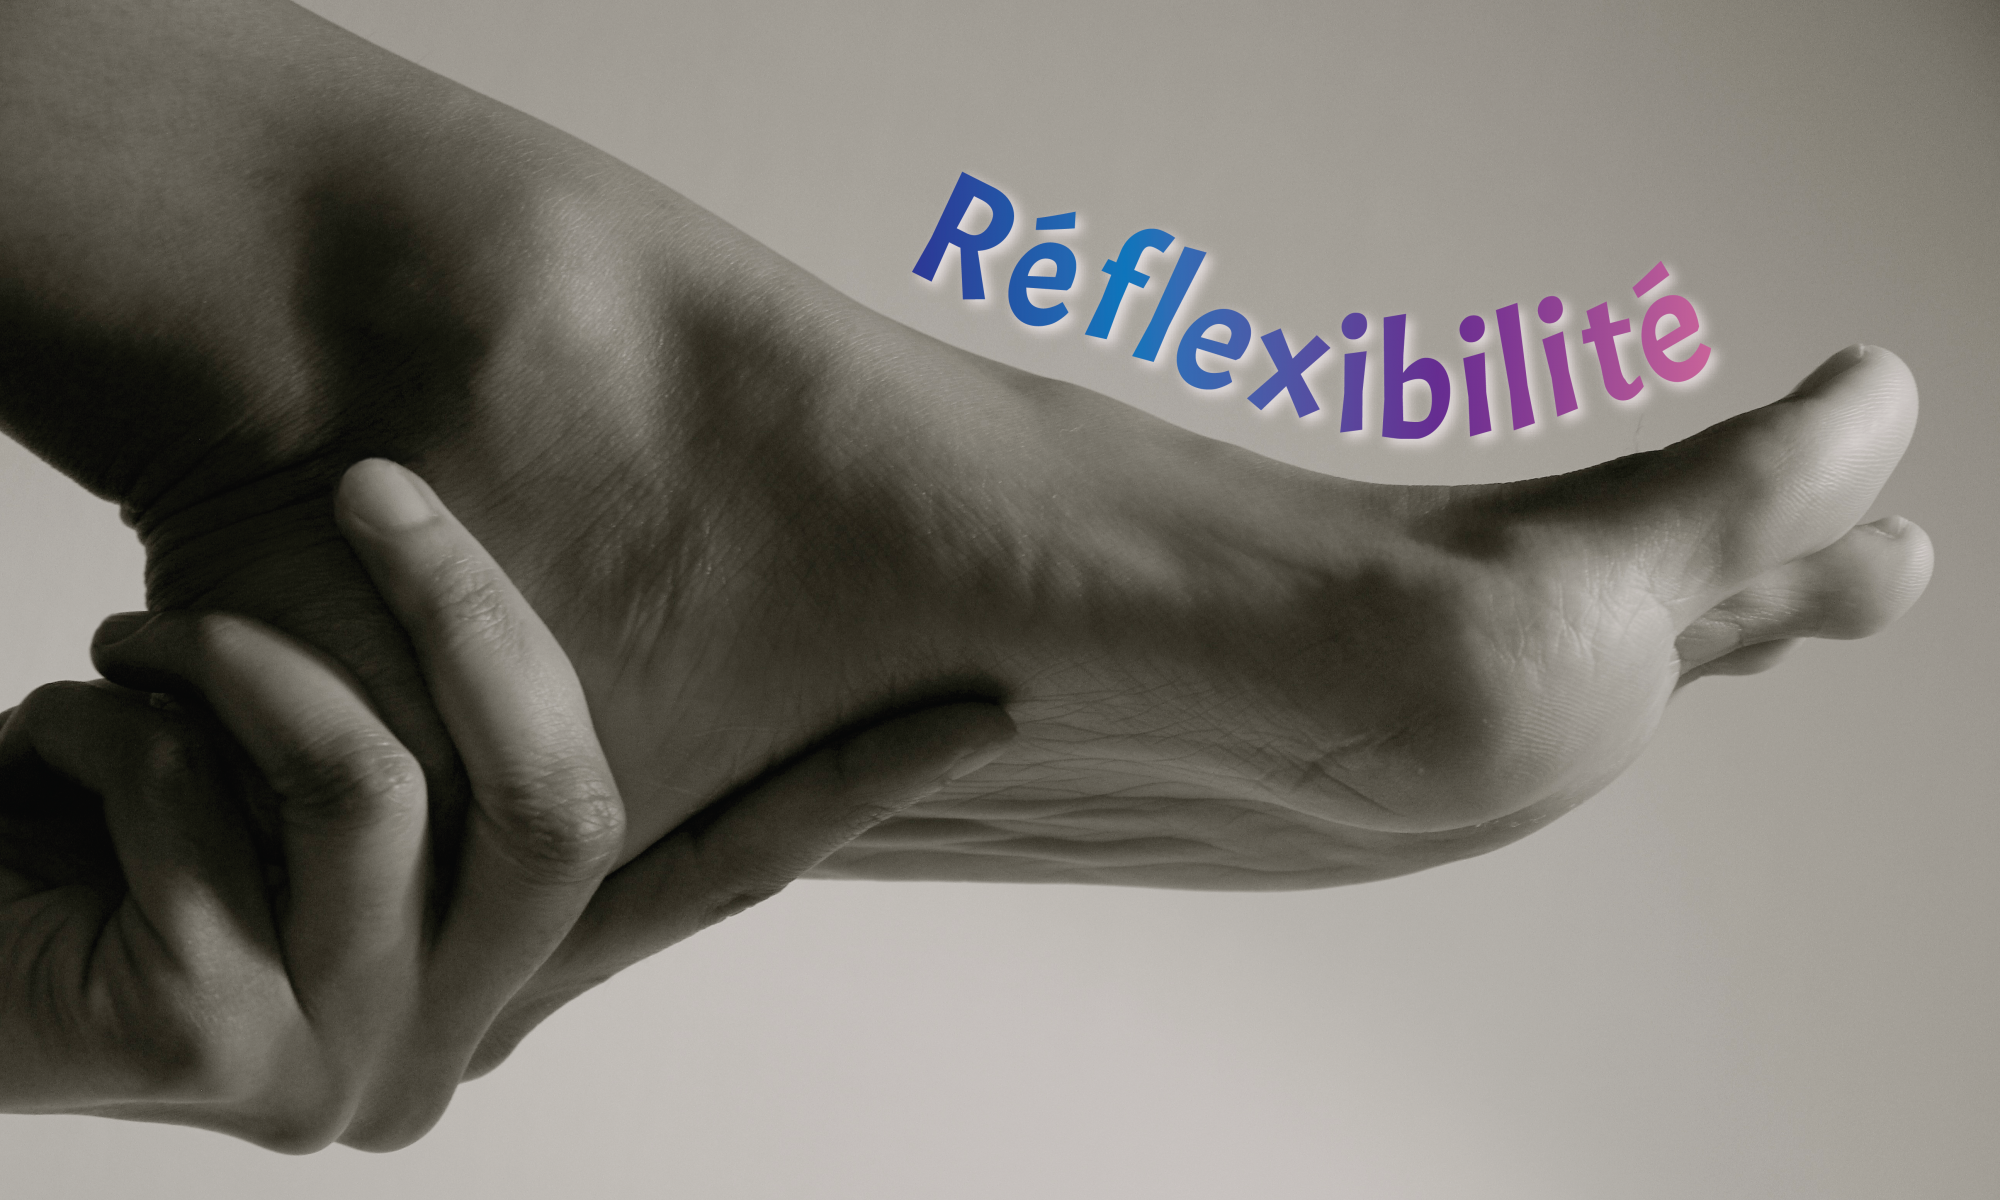 Reflexibilité